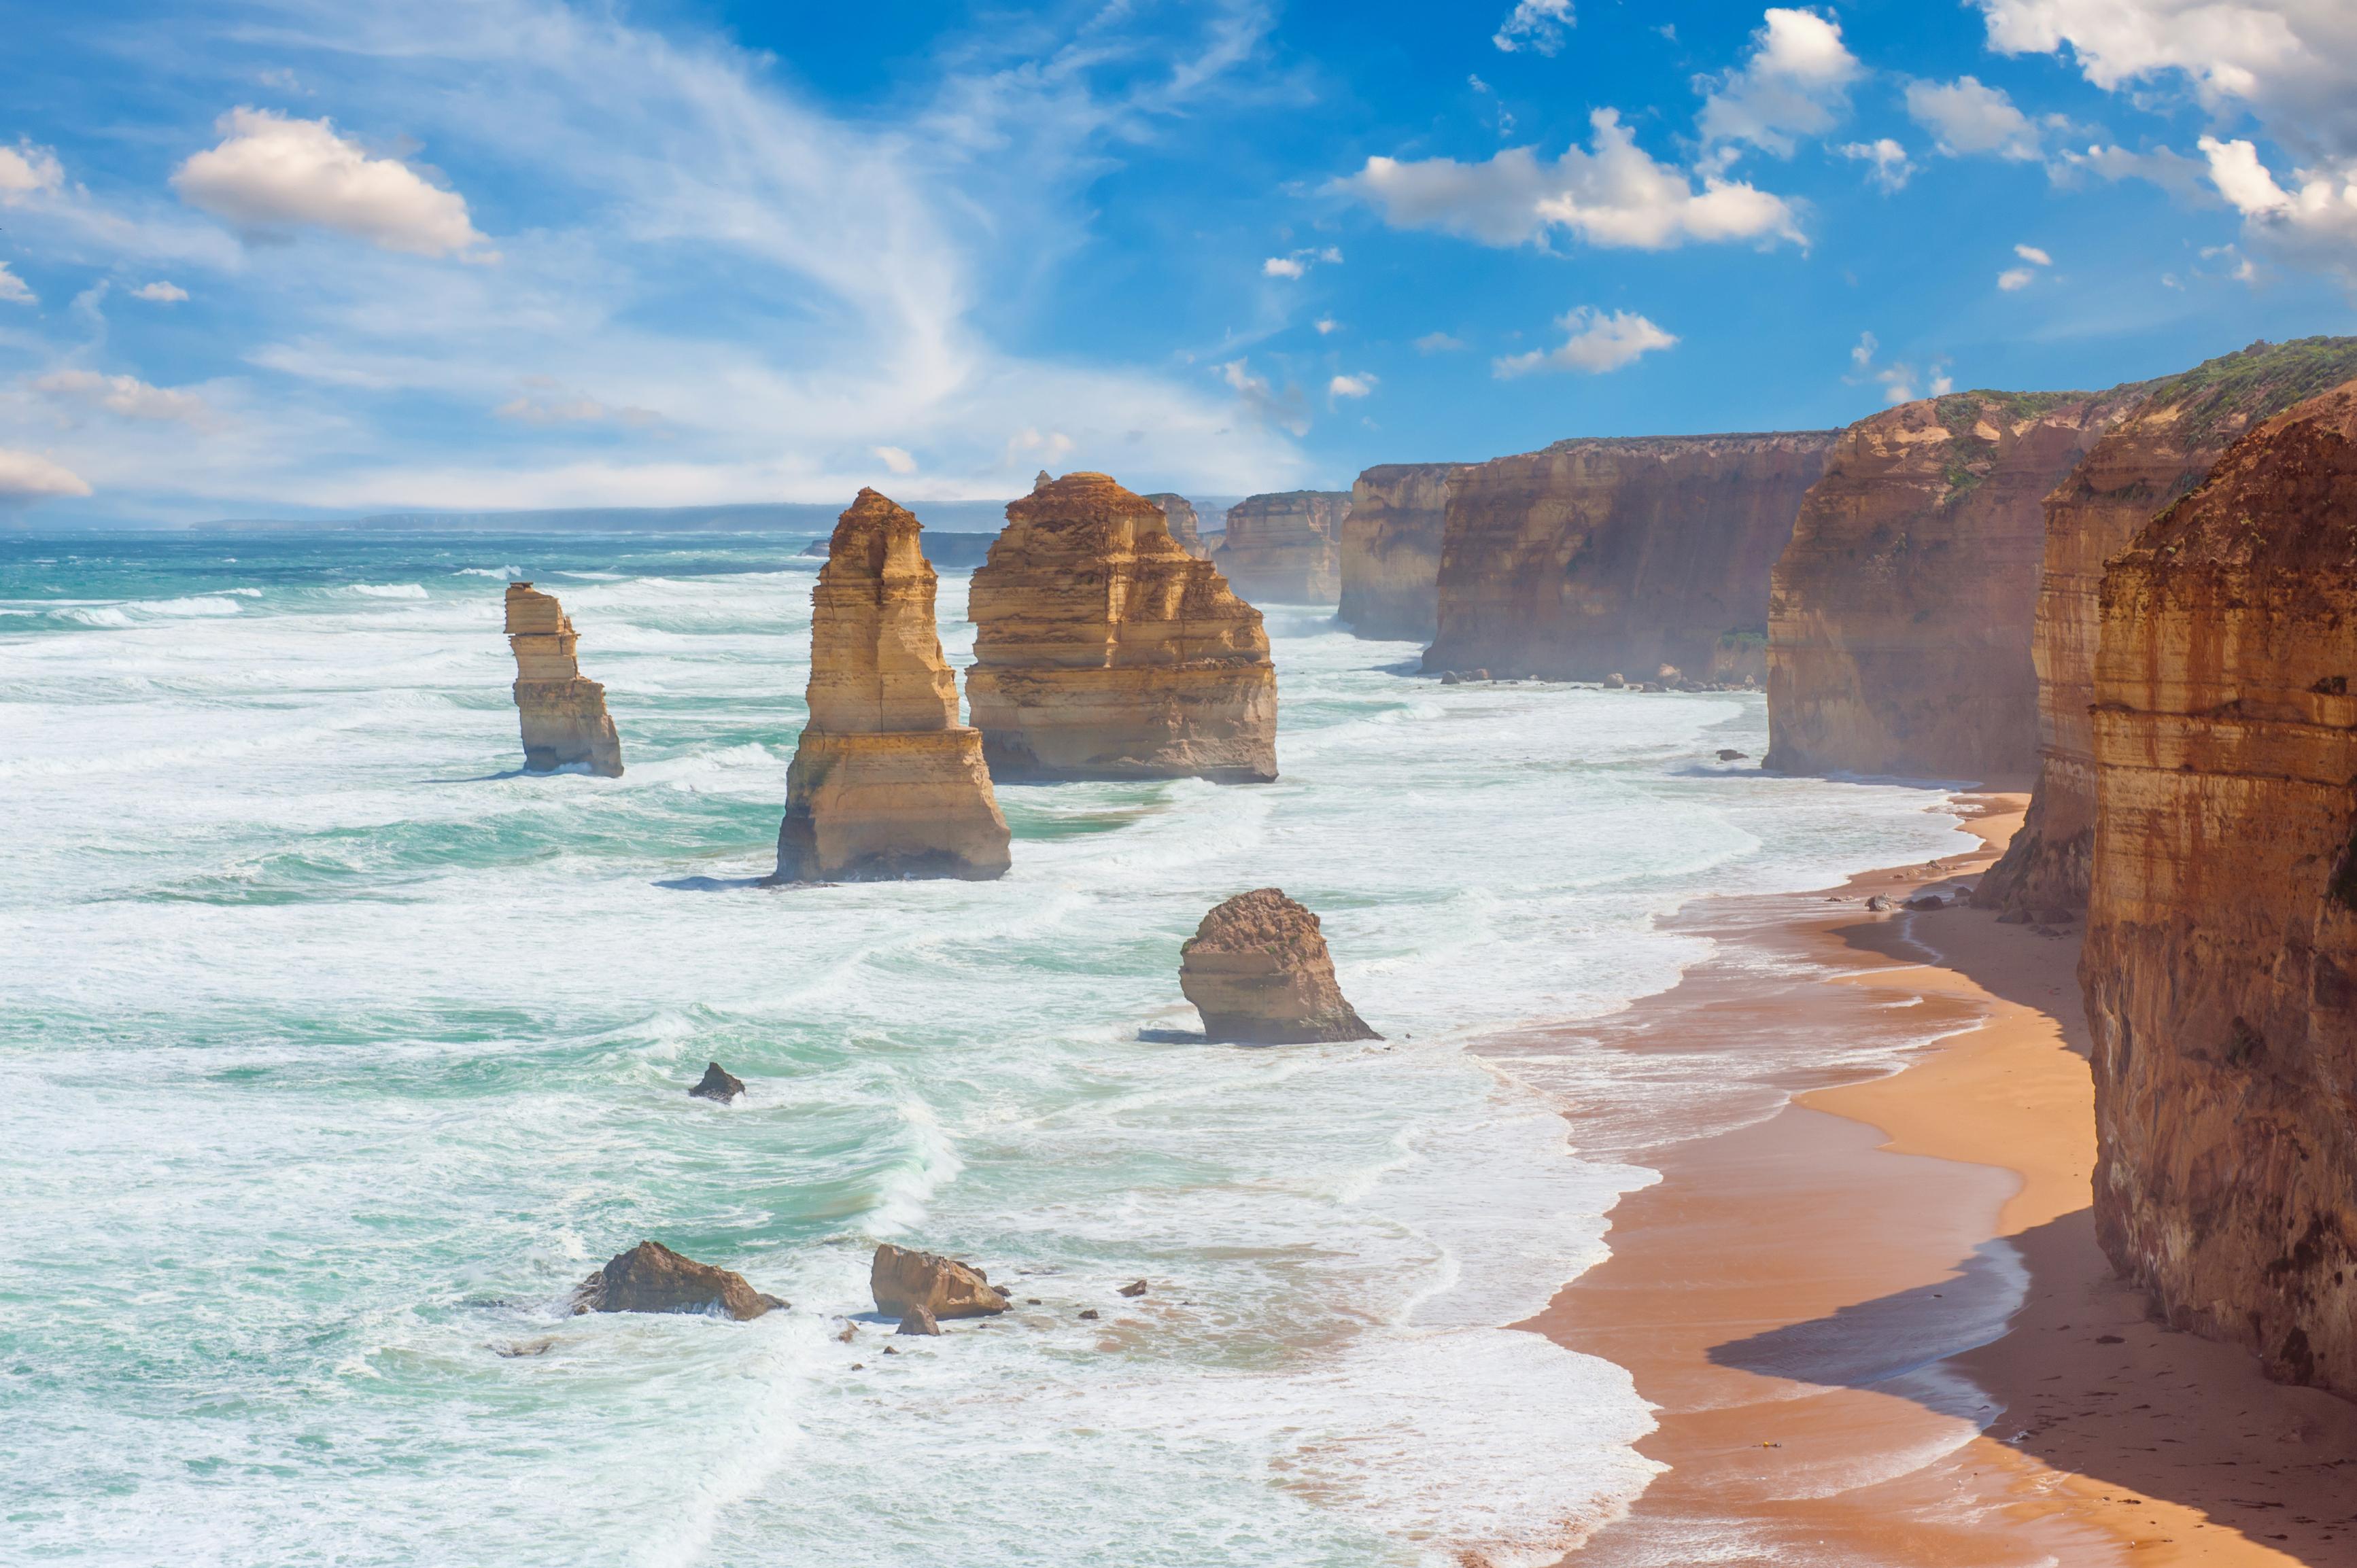 http://www.dreamstime.com/stock-photos-twelve-apostles-natural-landmark-near-great-ocean-road-victoria-australia-image43892383